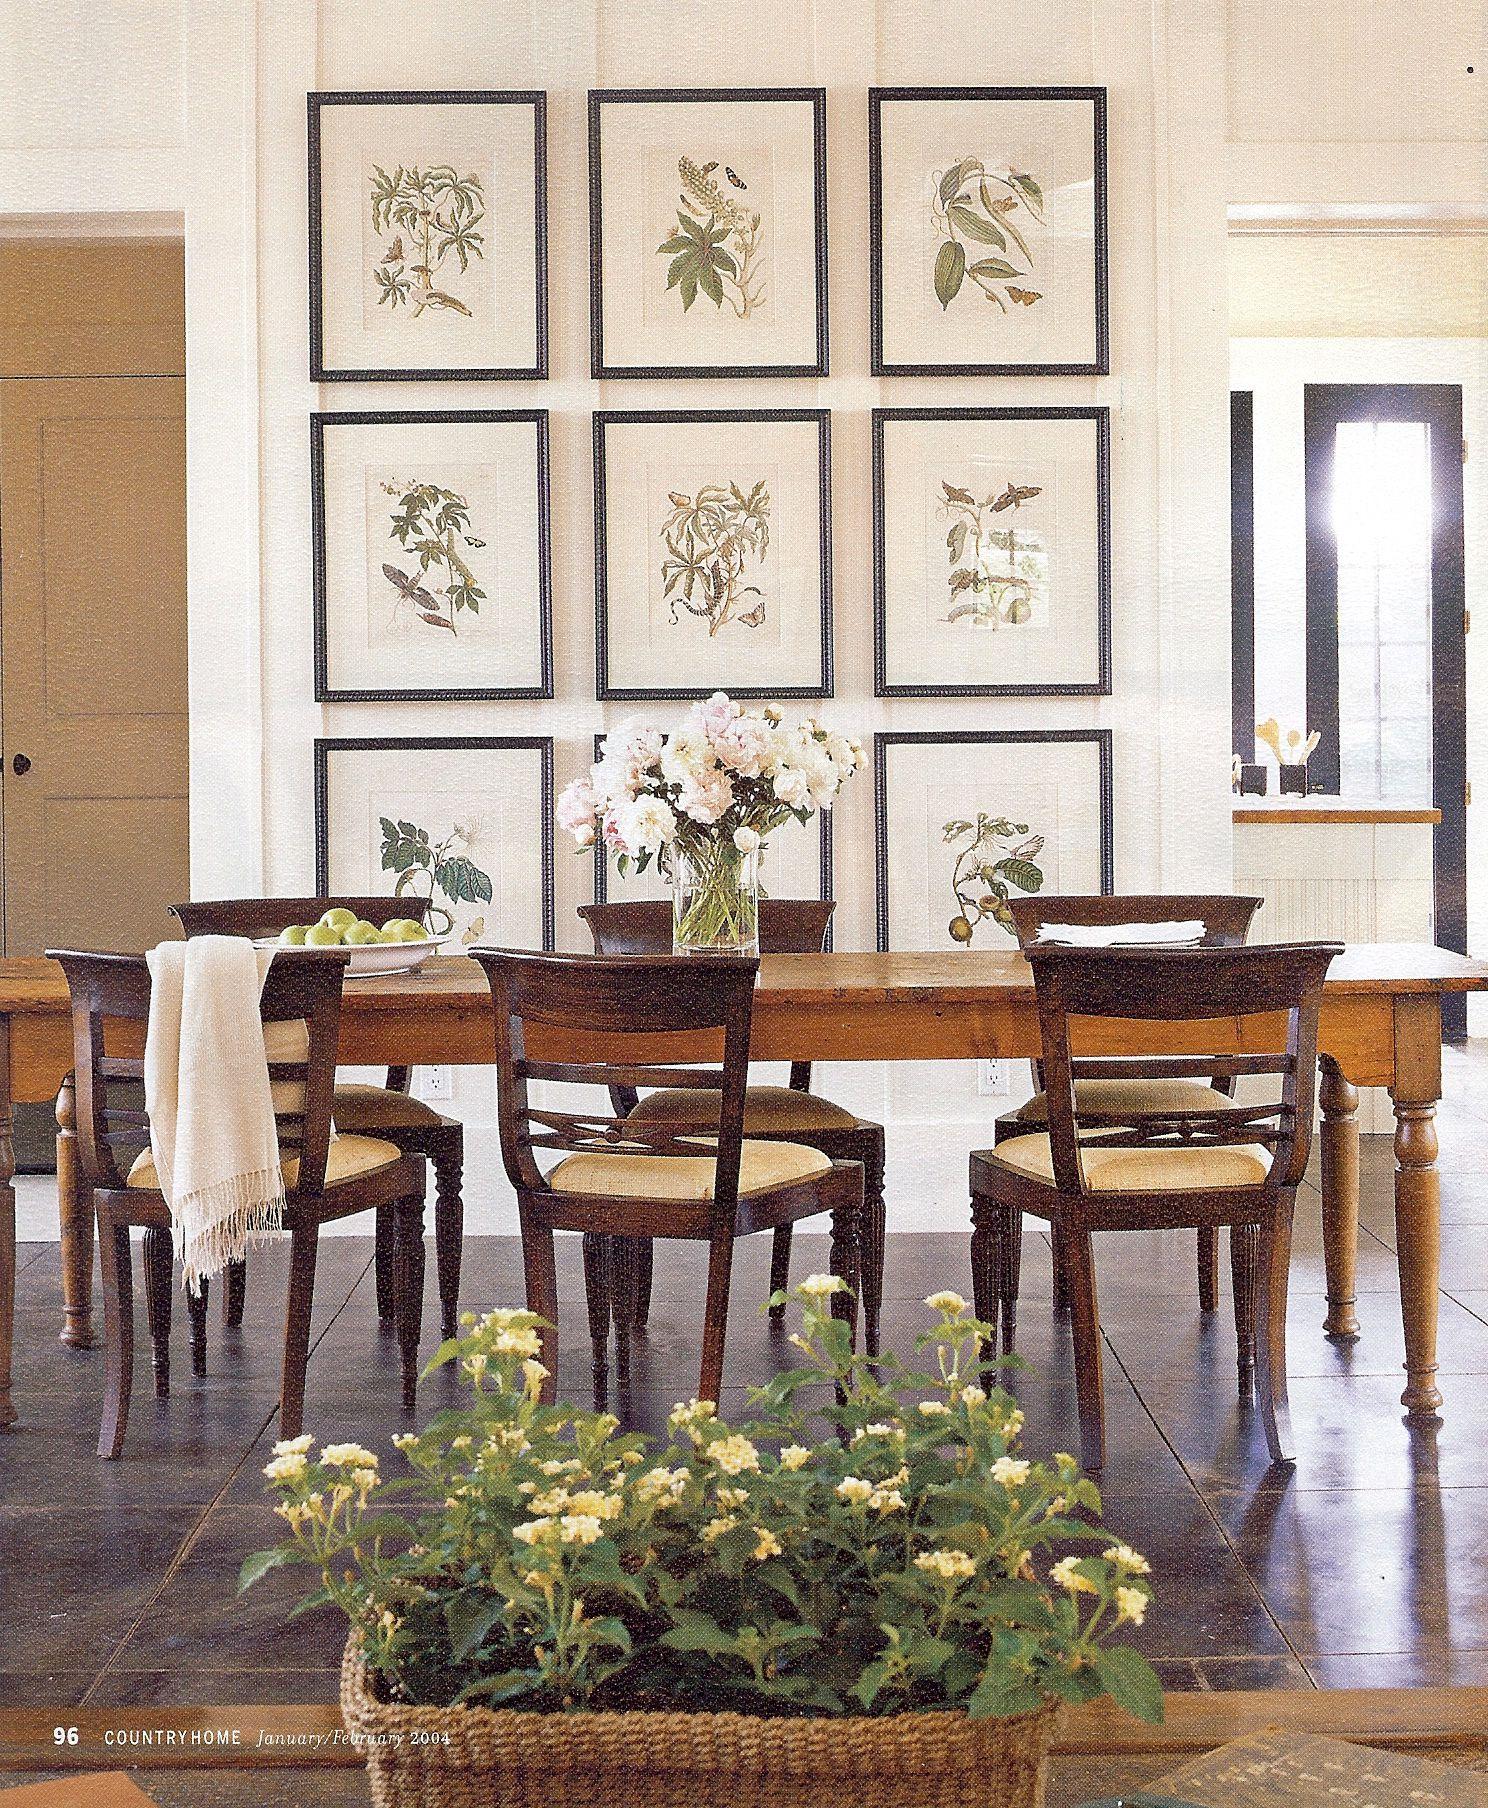 Interior design my future home pinterest interiors room and